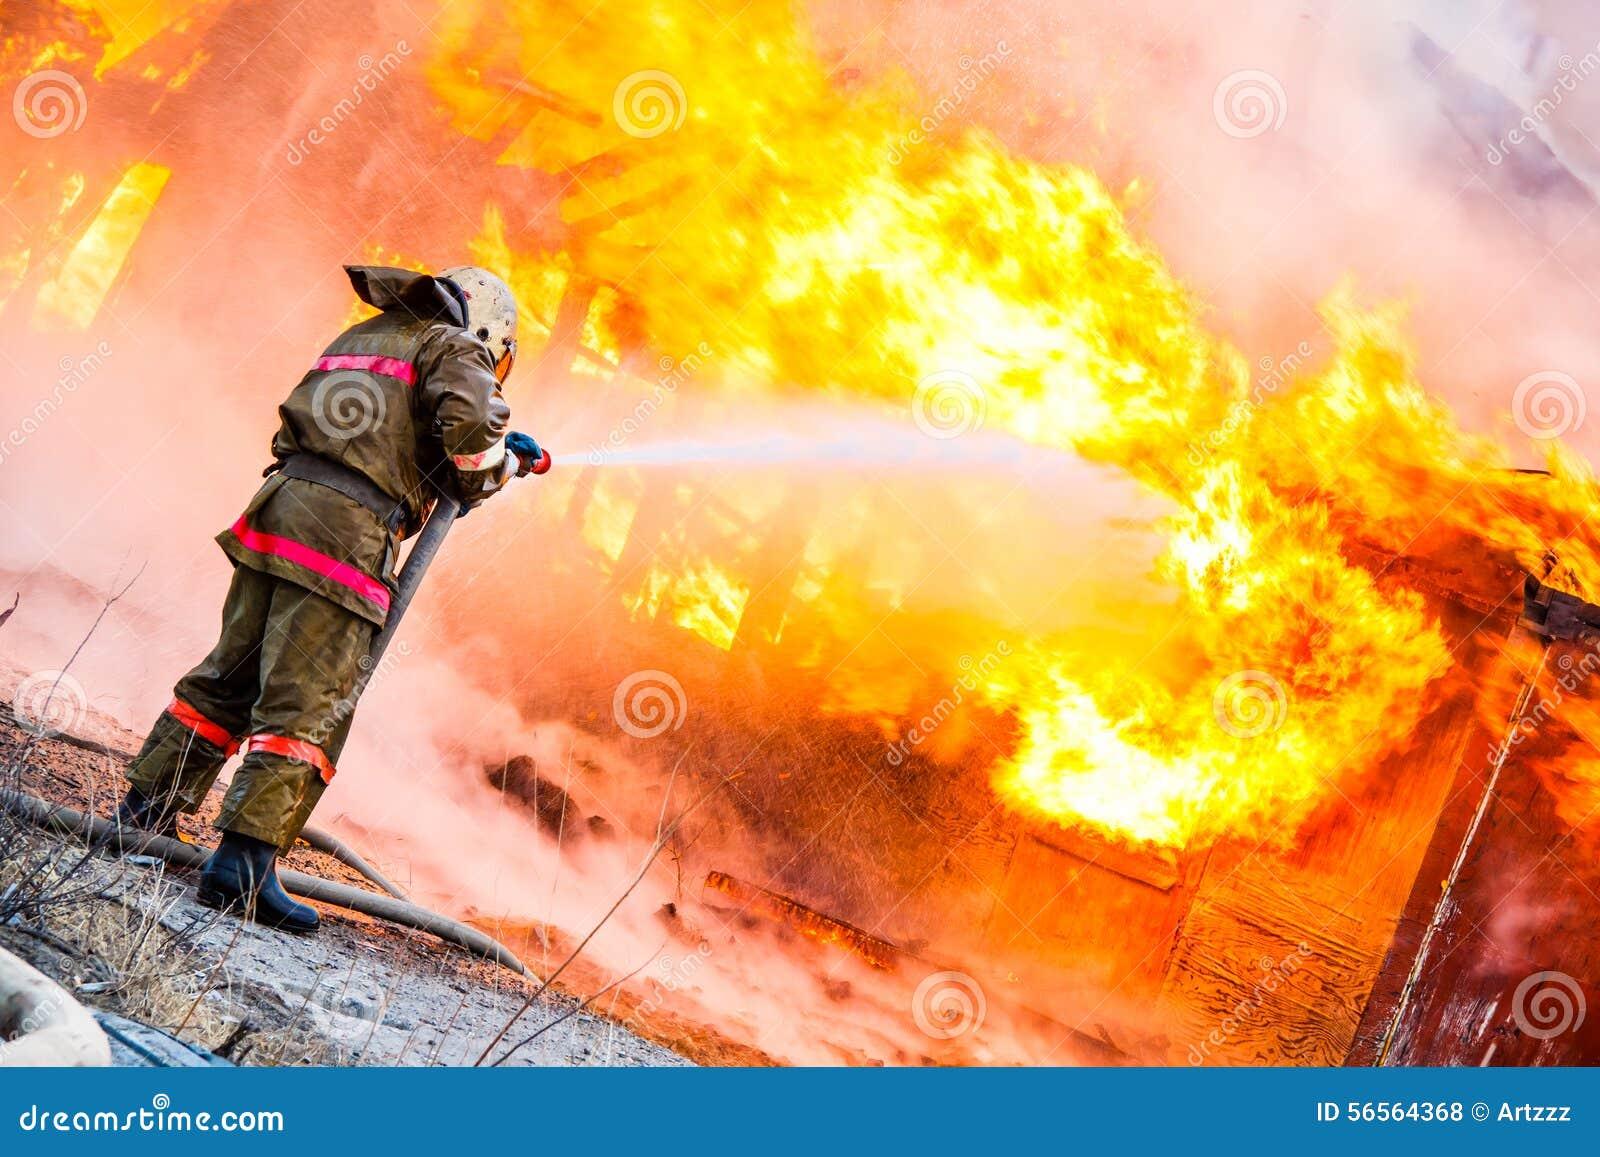 Download Ο πυροσβέστης εξαφανίζει μια πυρκαγιά Στοκ Εικόνες - εικόνα από κίνδυνος, έξυπνο: 56564368